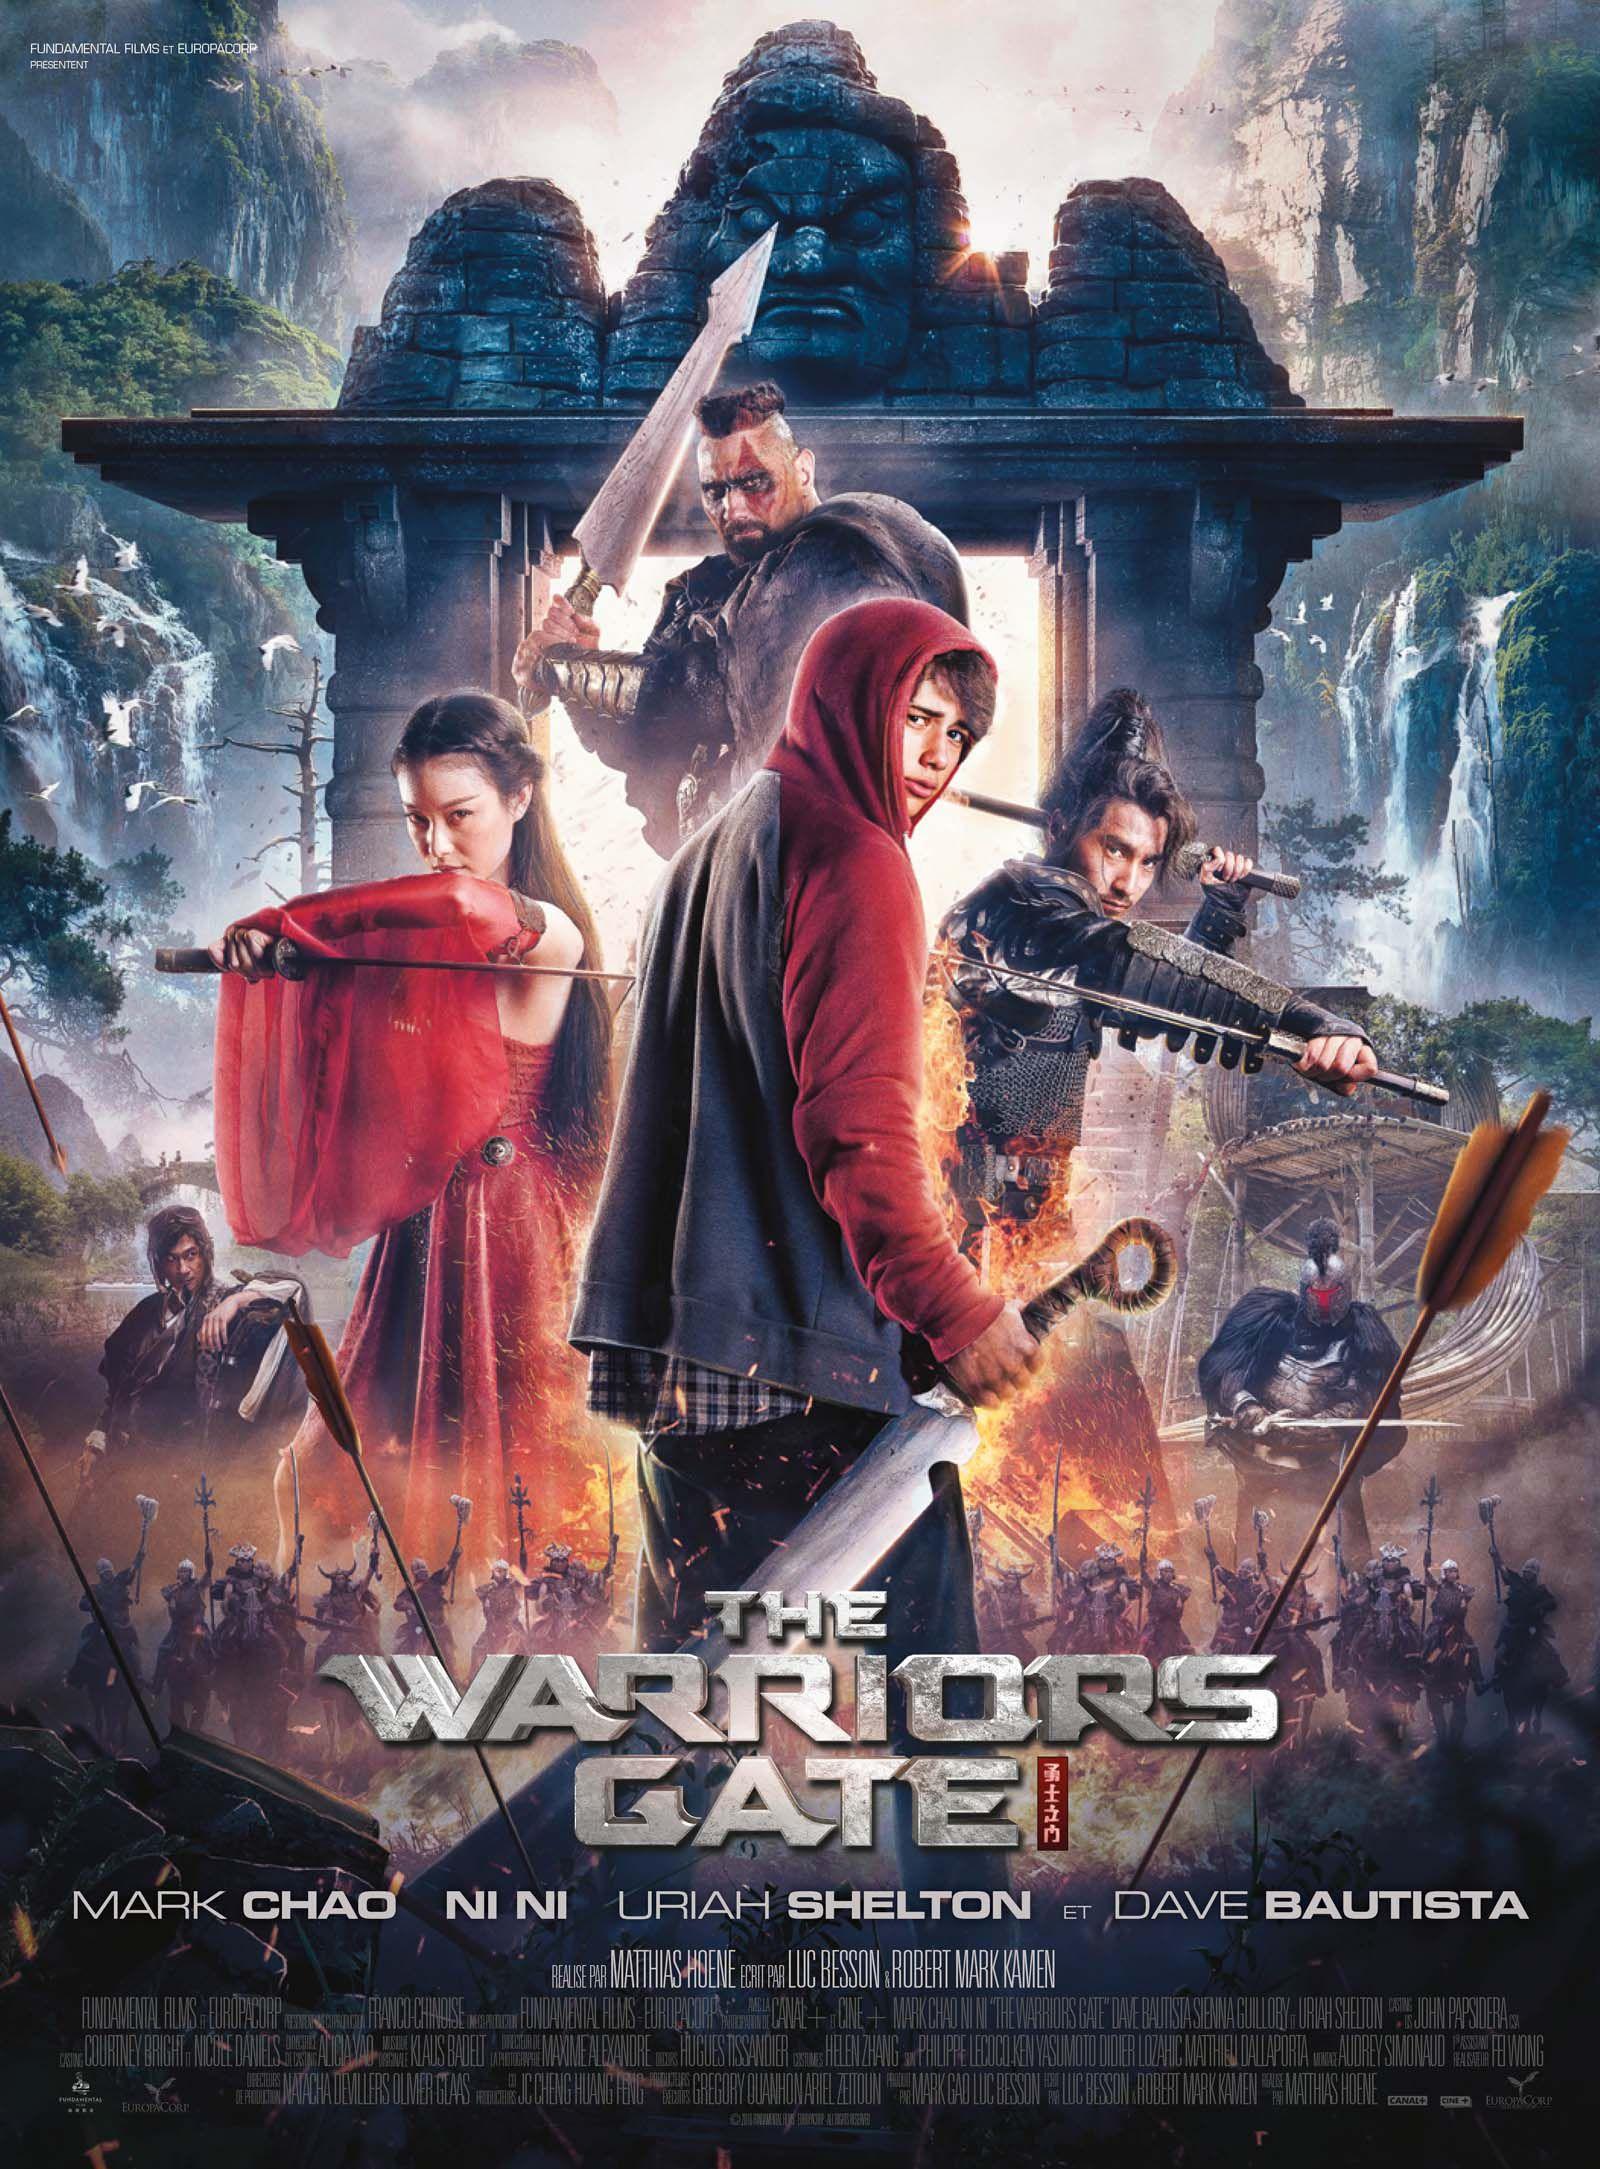 The Warriors Gate - Film (2016)